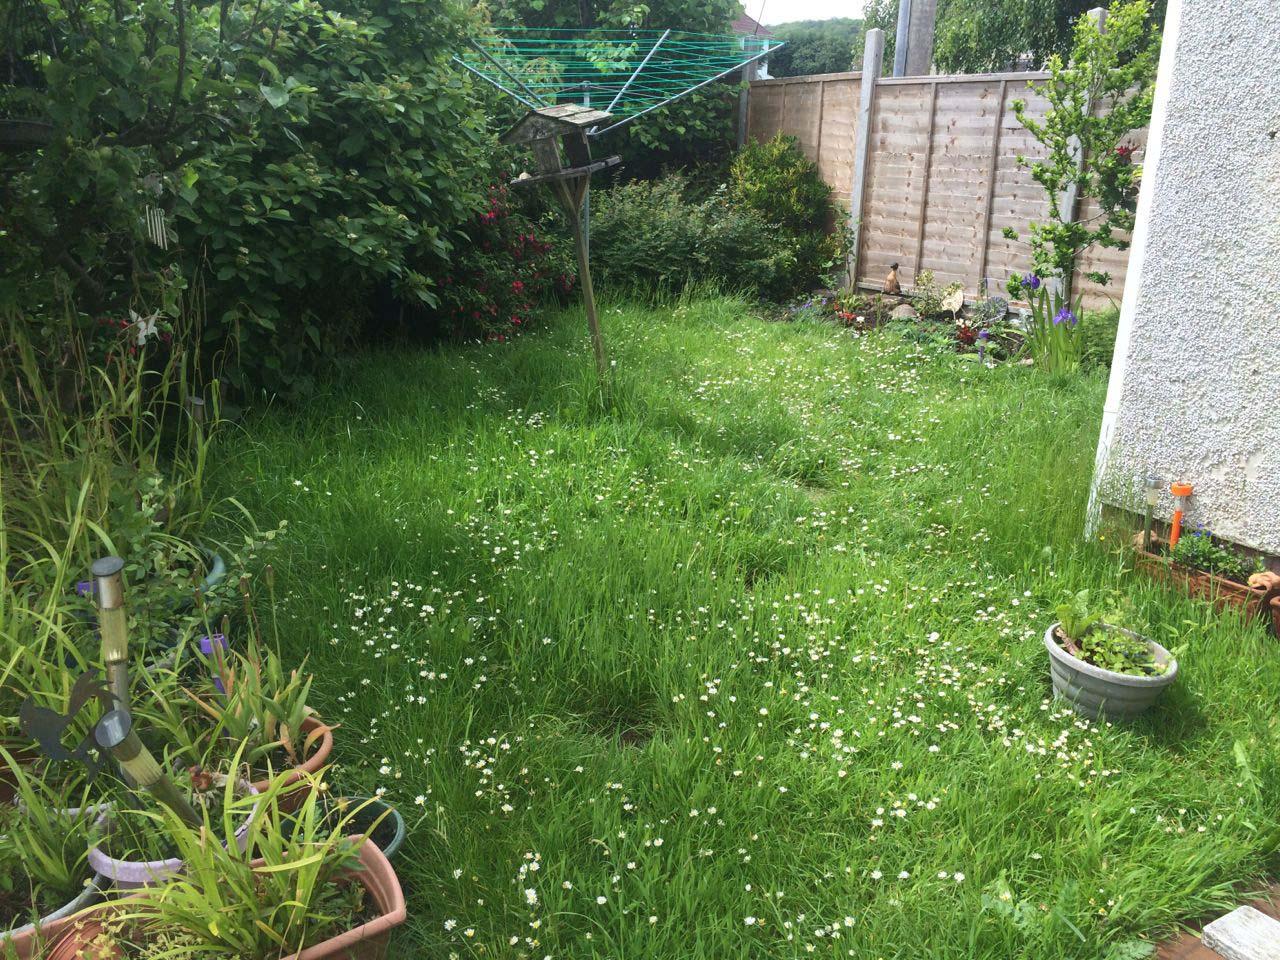 Grass Cutting Weston super Mare Before